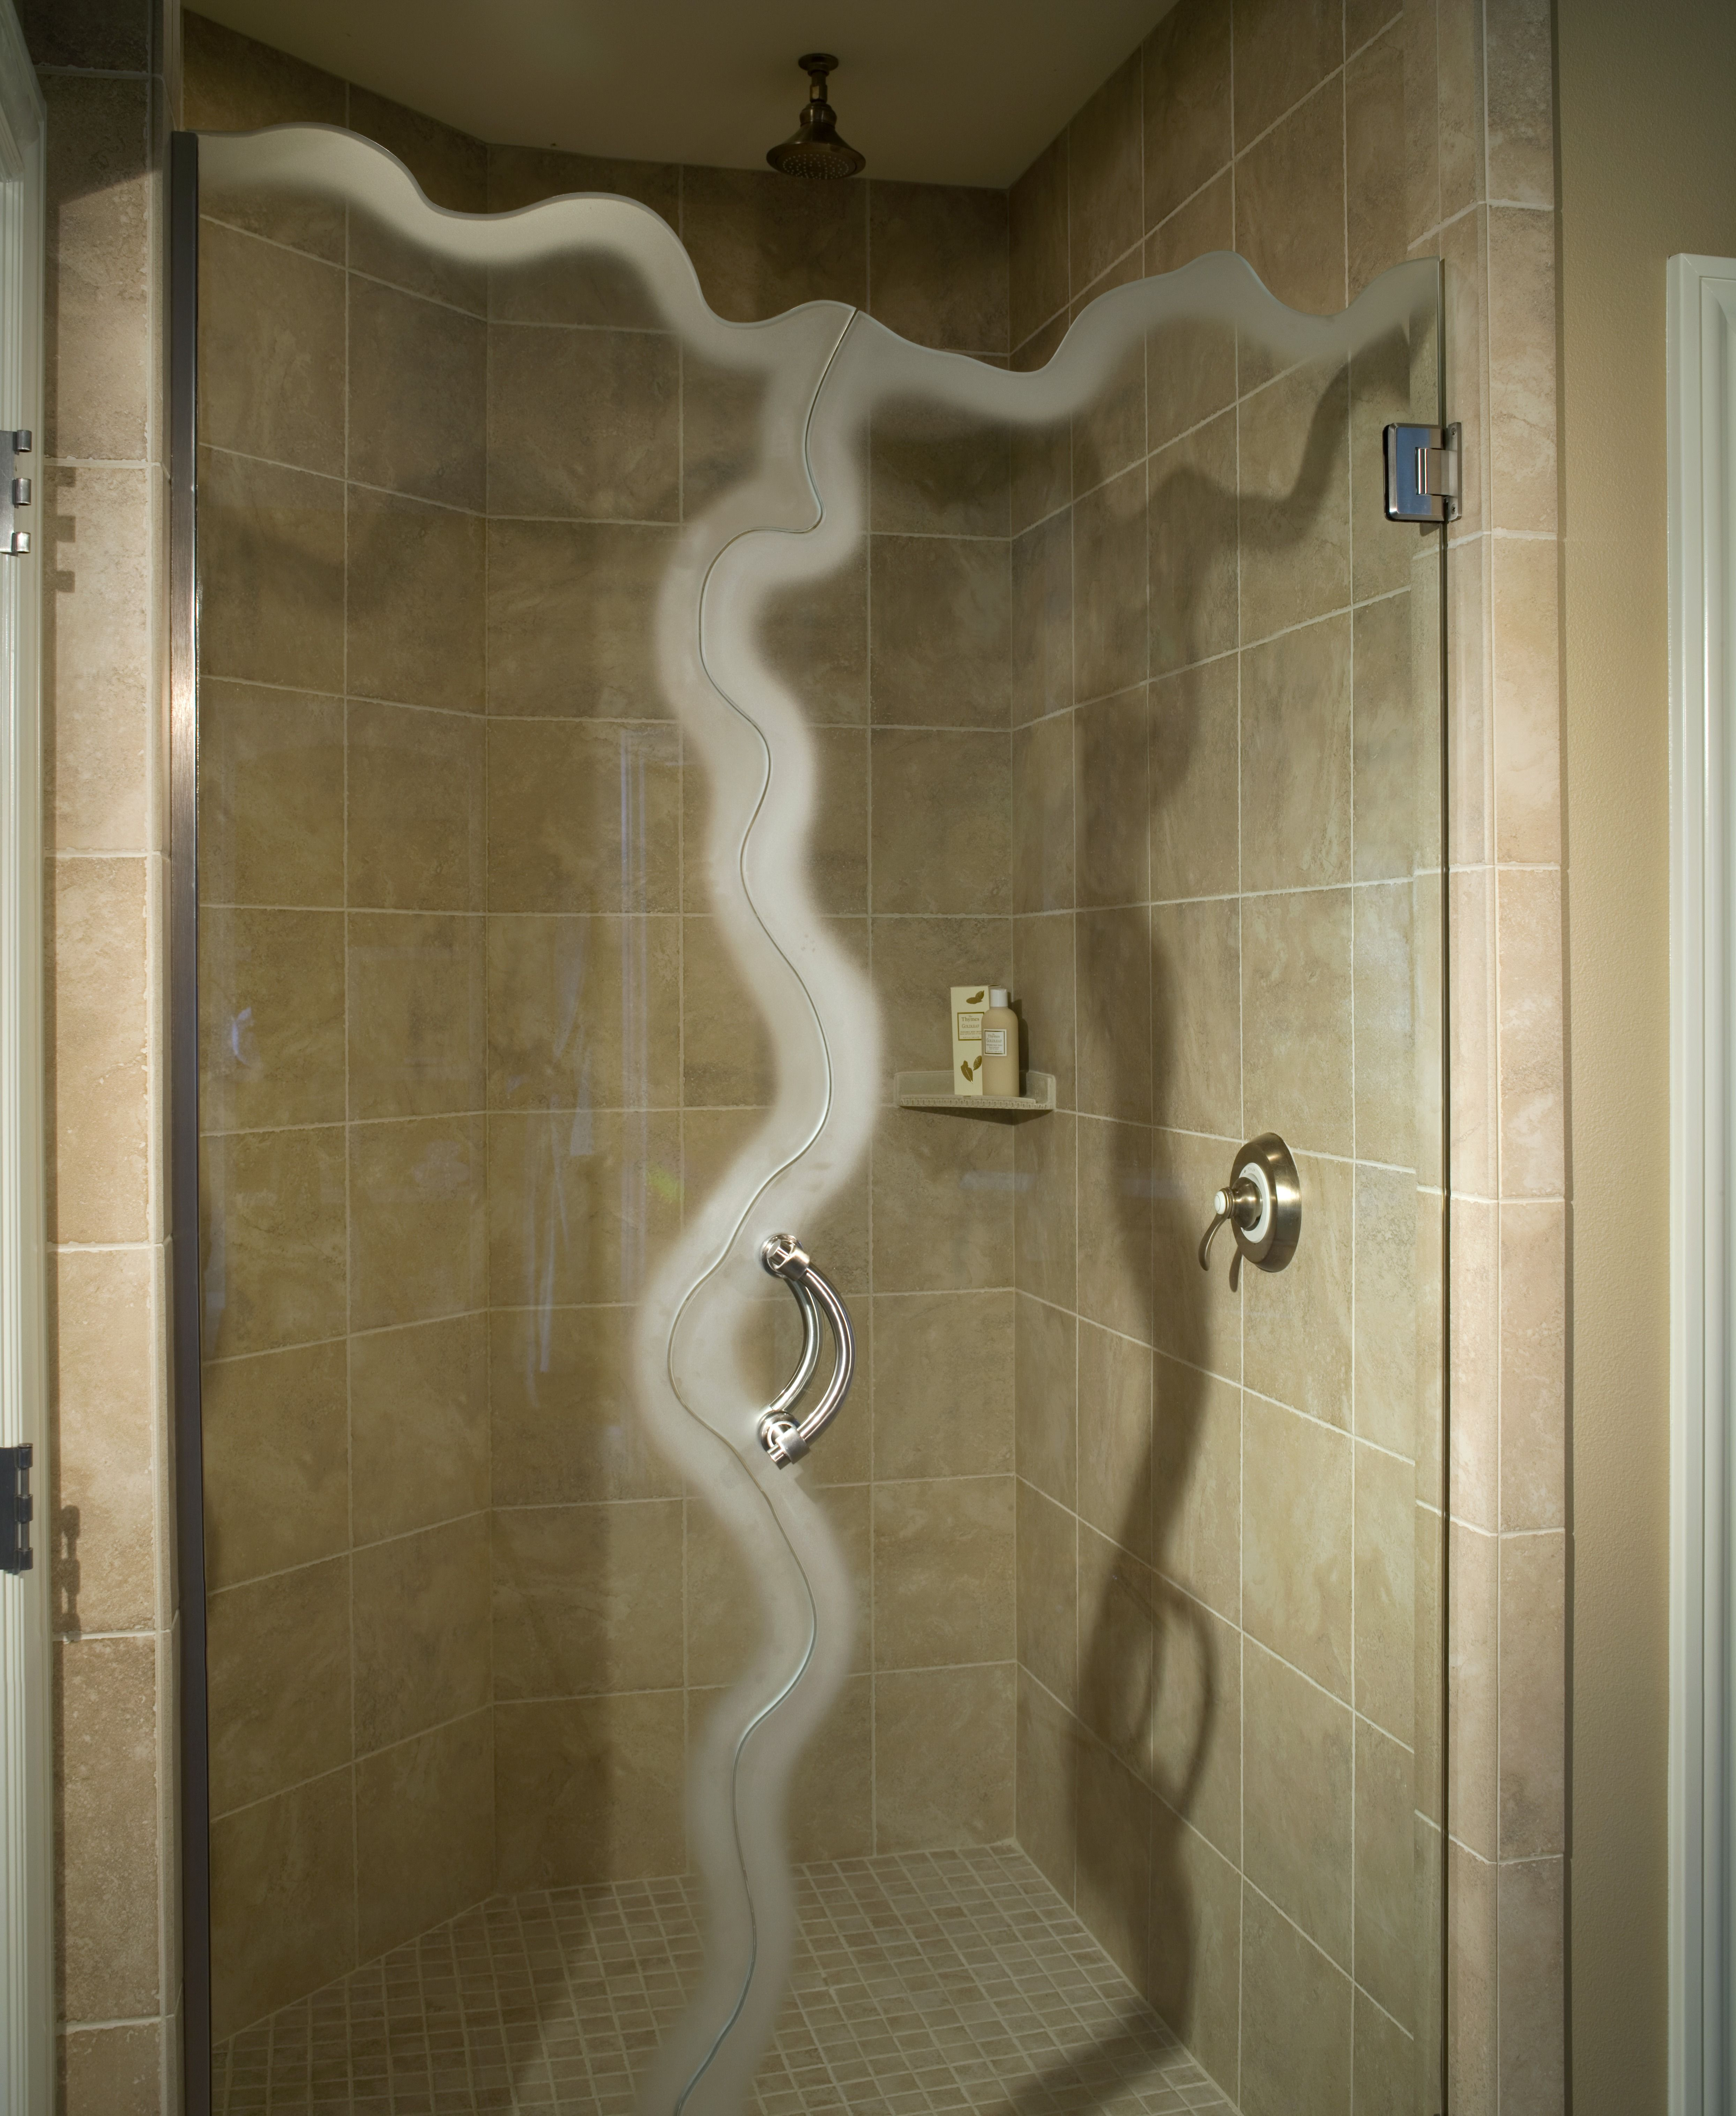 Glass Shower Door Installation Costs Price To Replace Shower Door Shower Doors Replace Shower Glass Shower